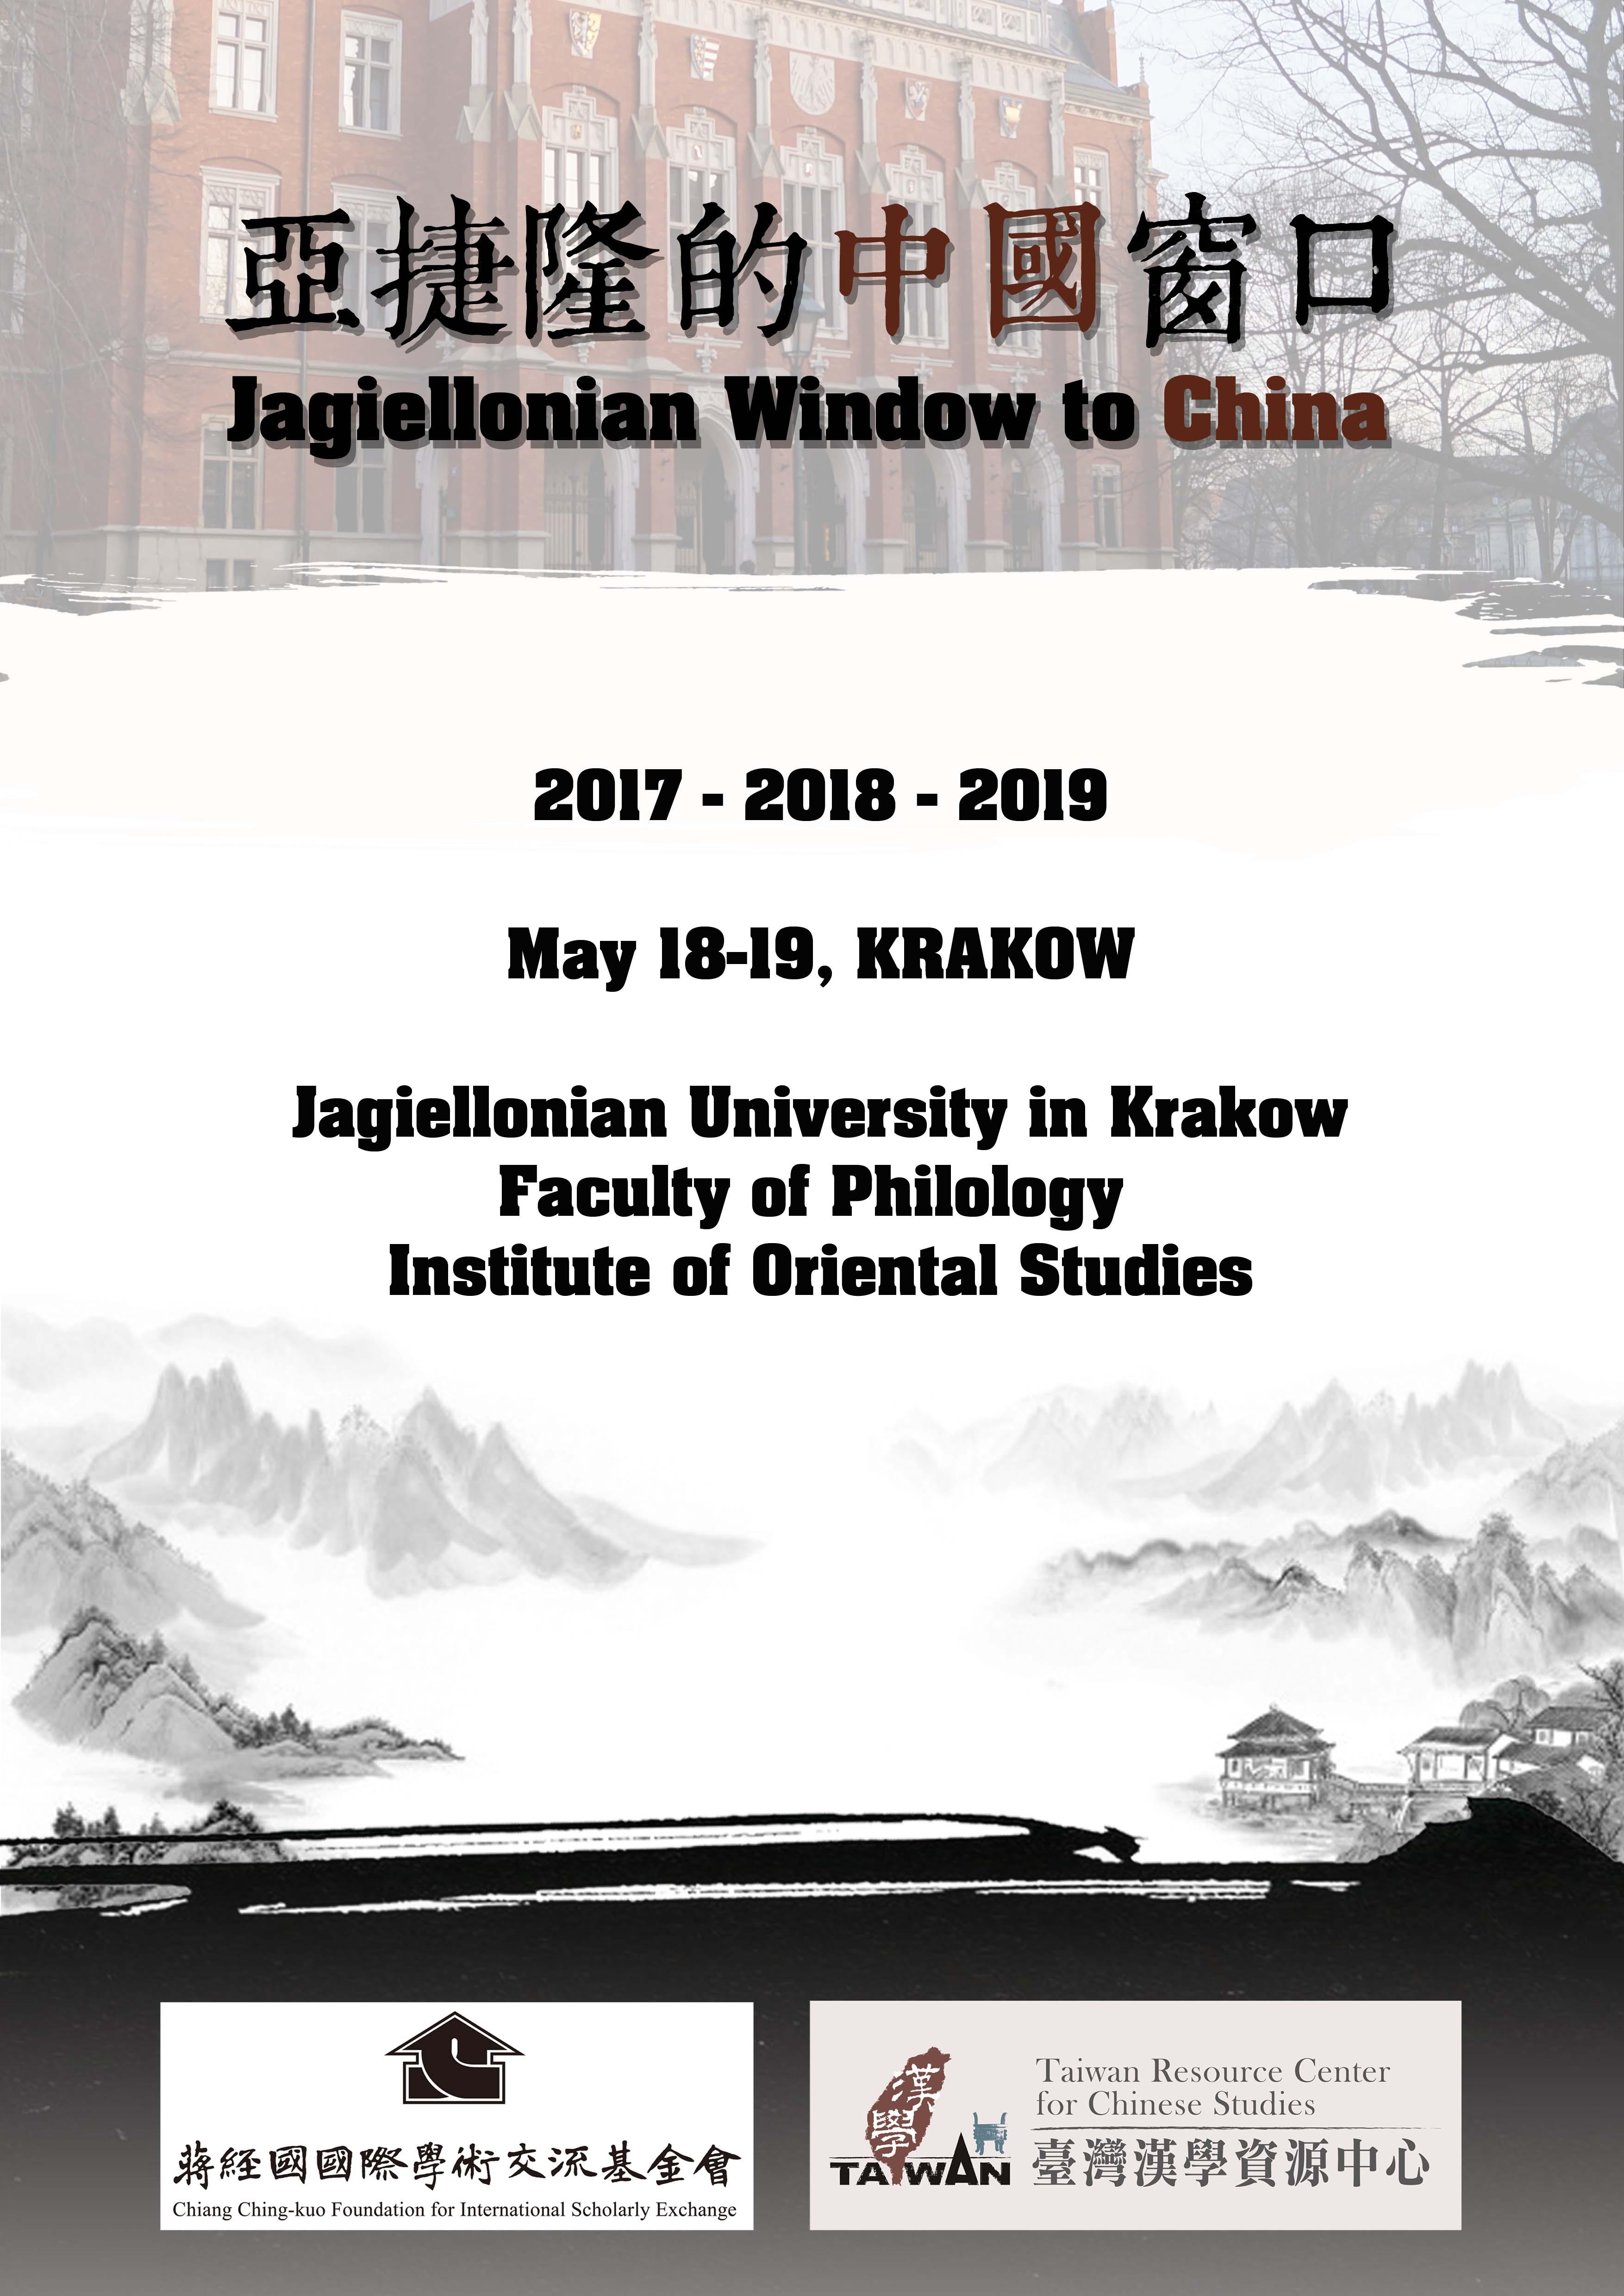 miniatura Seminarium Sinologiczne: Jagiellońskie okno na Chiny